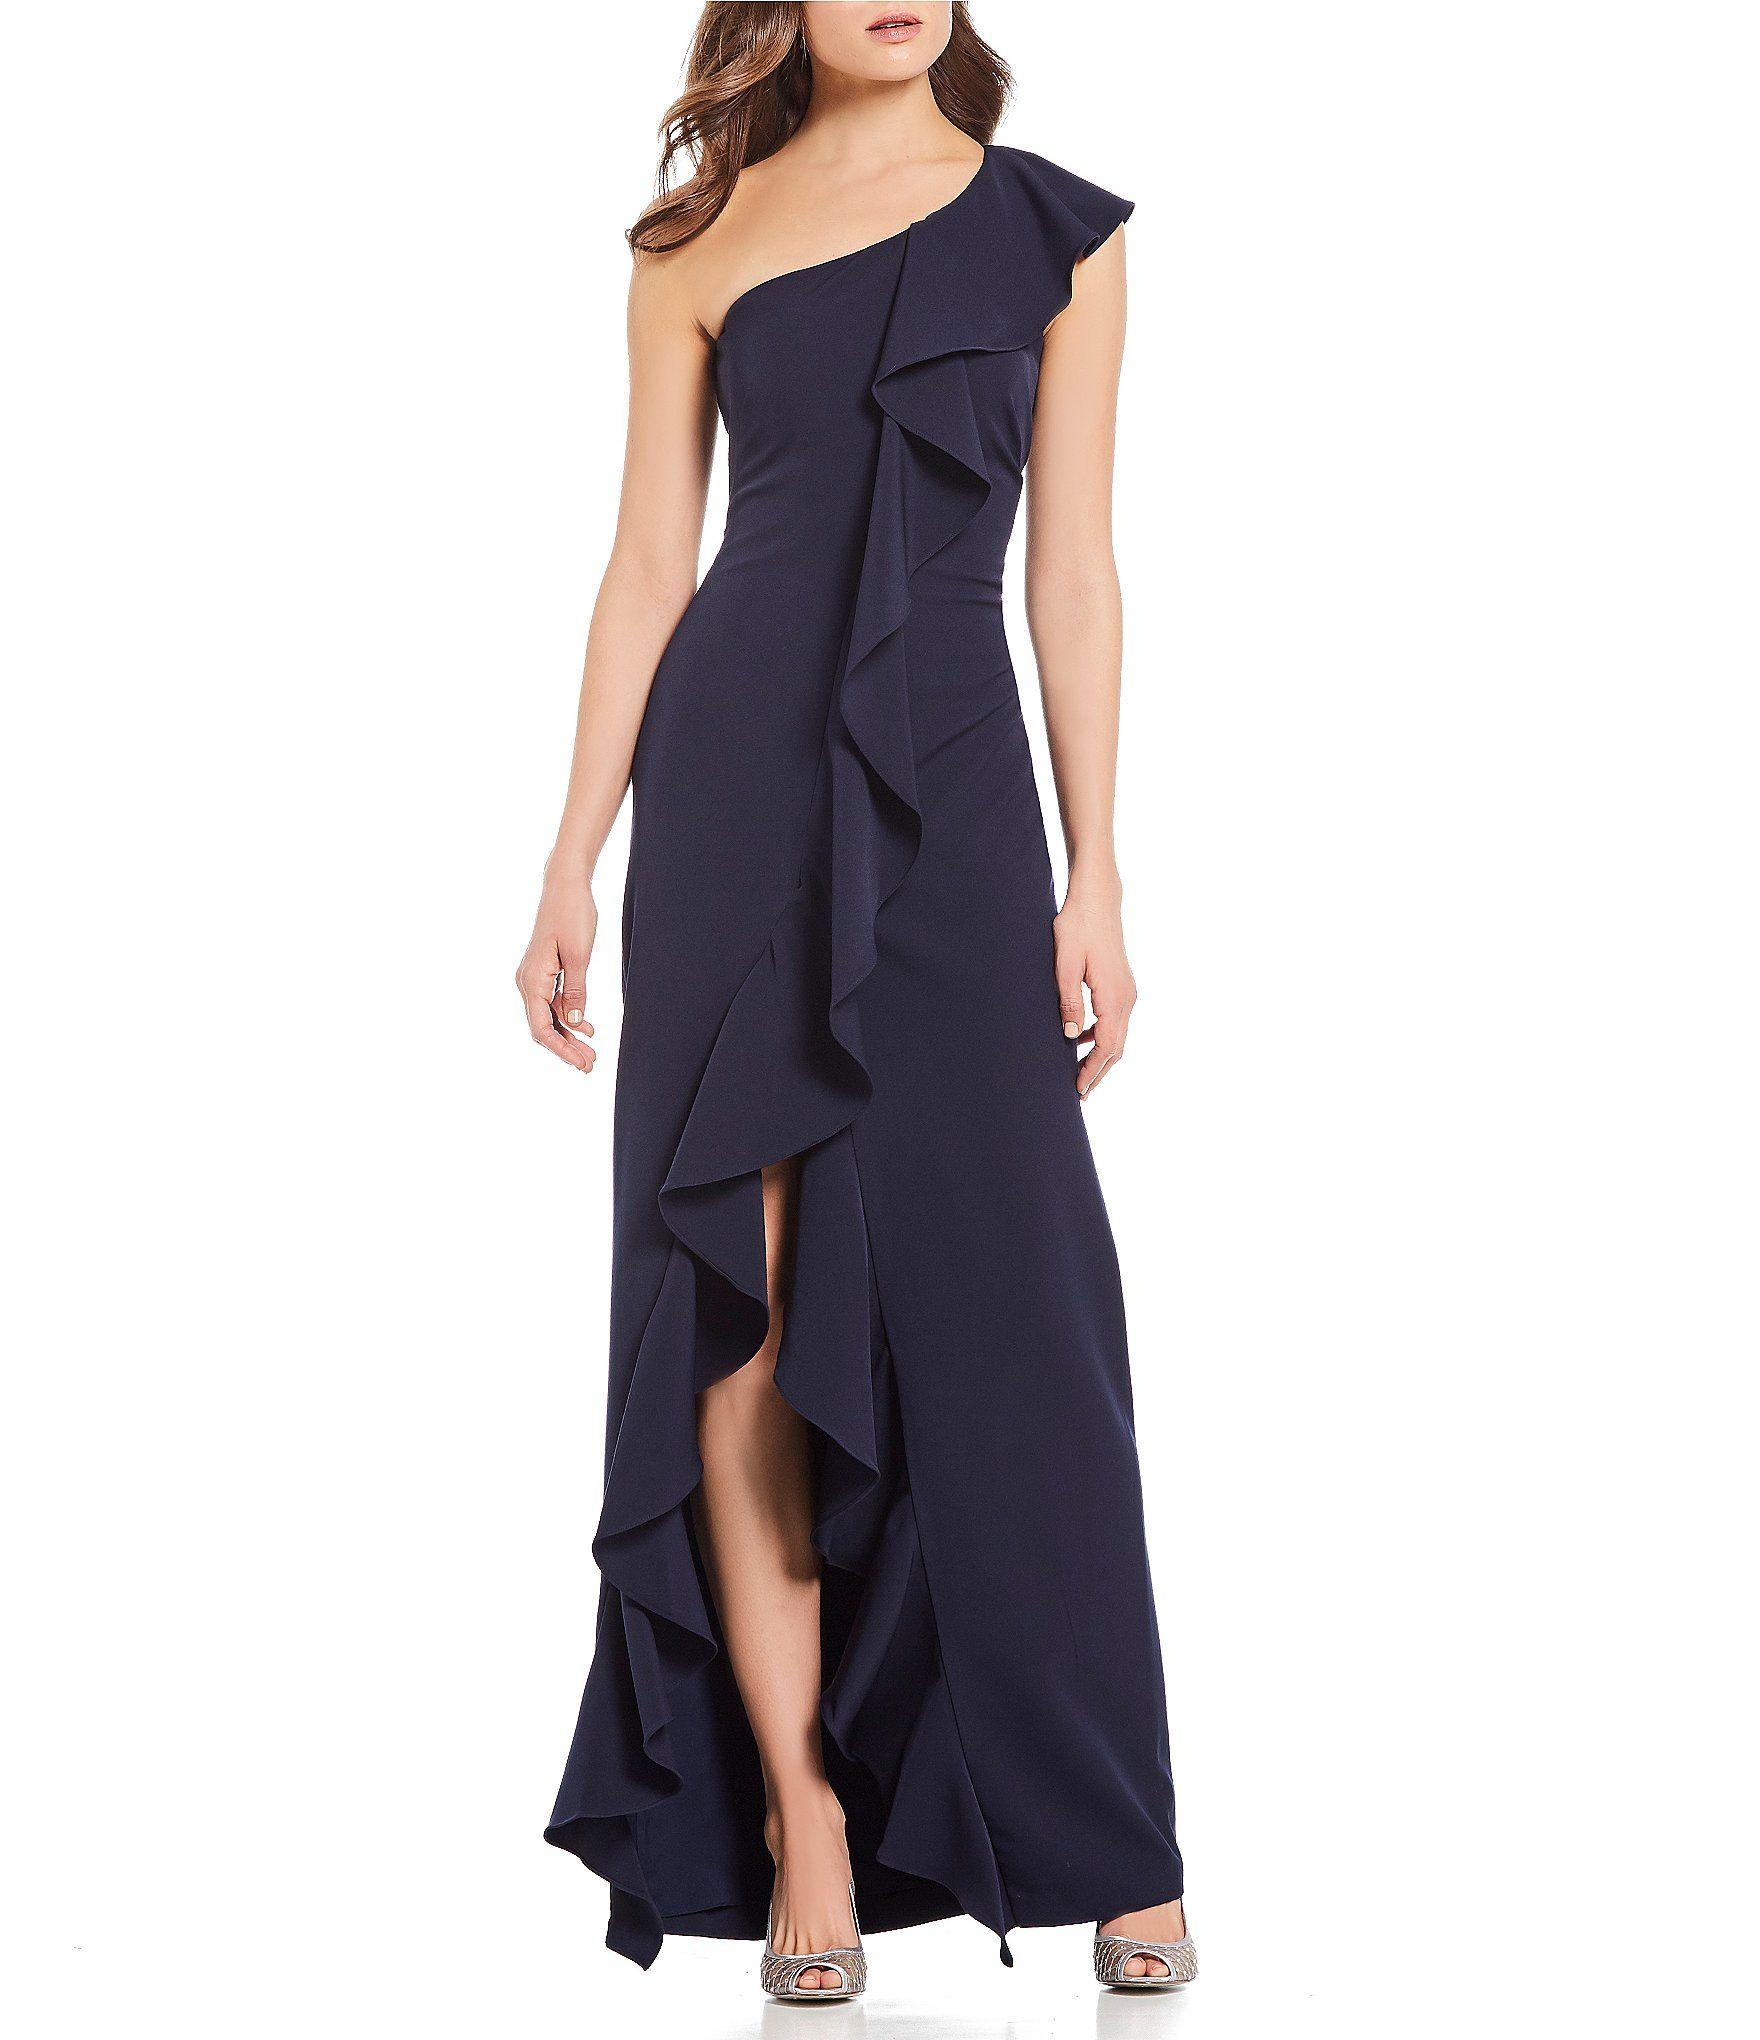 Eliza J One Shoulder Ruffle Gown Dillard S Evening Gown Dresses Women Wedding Guest Dresses Gowns [ 2040 x 1760 Pixel ]